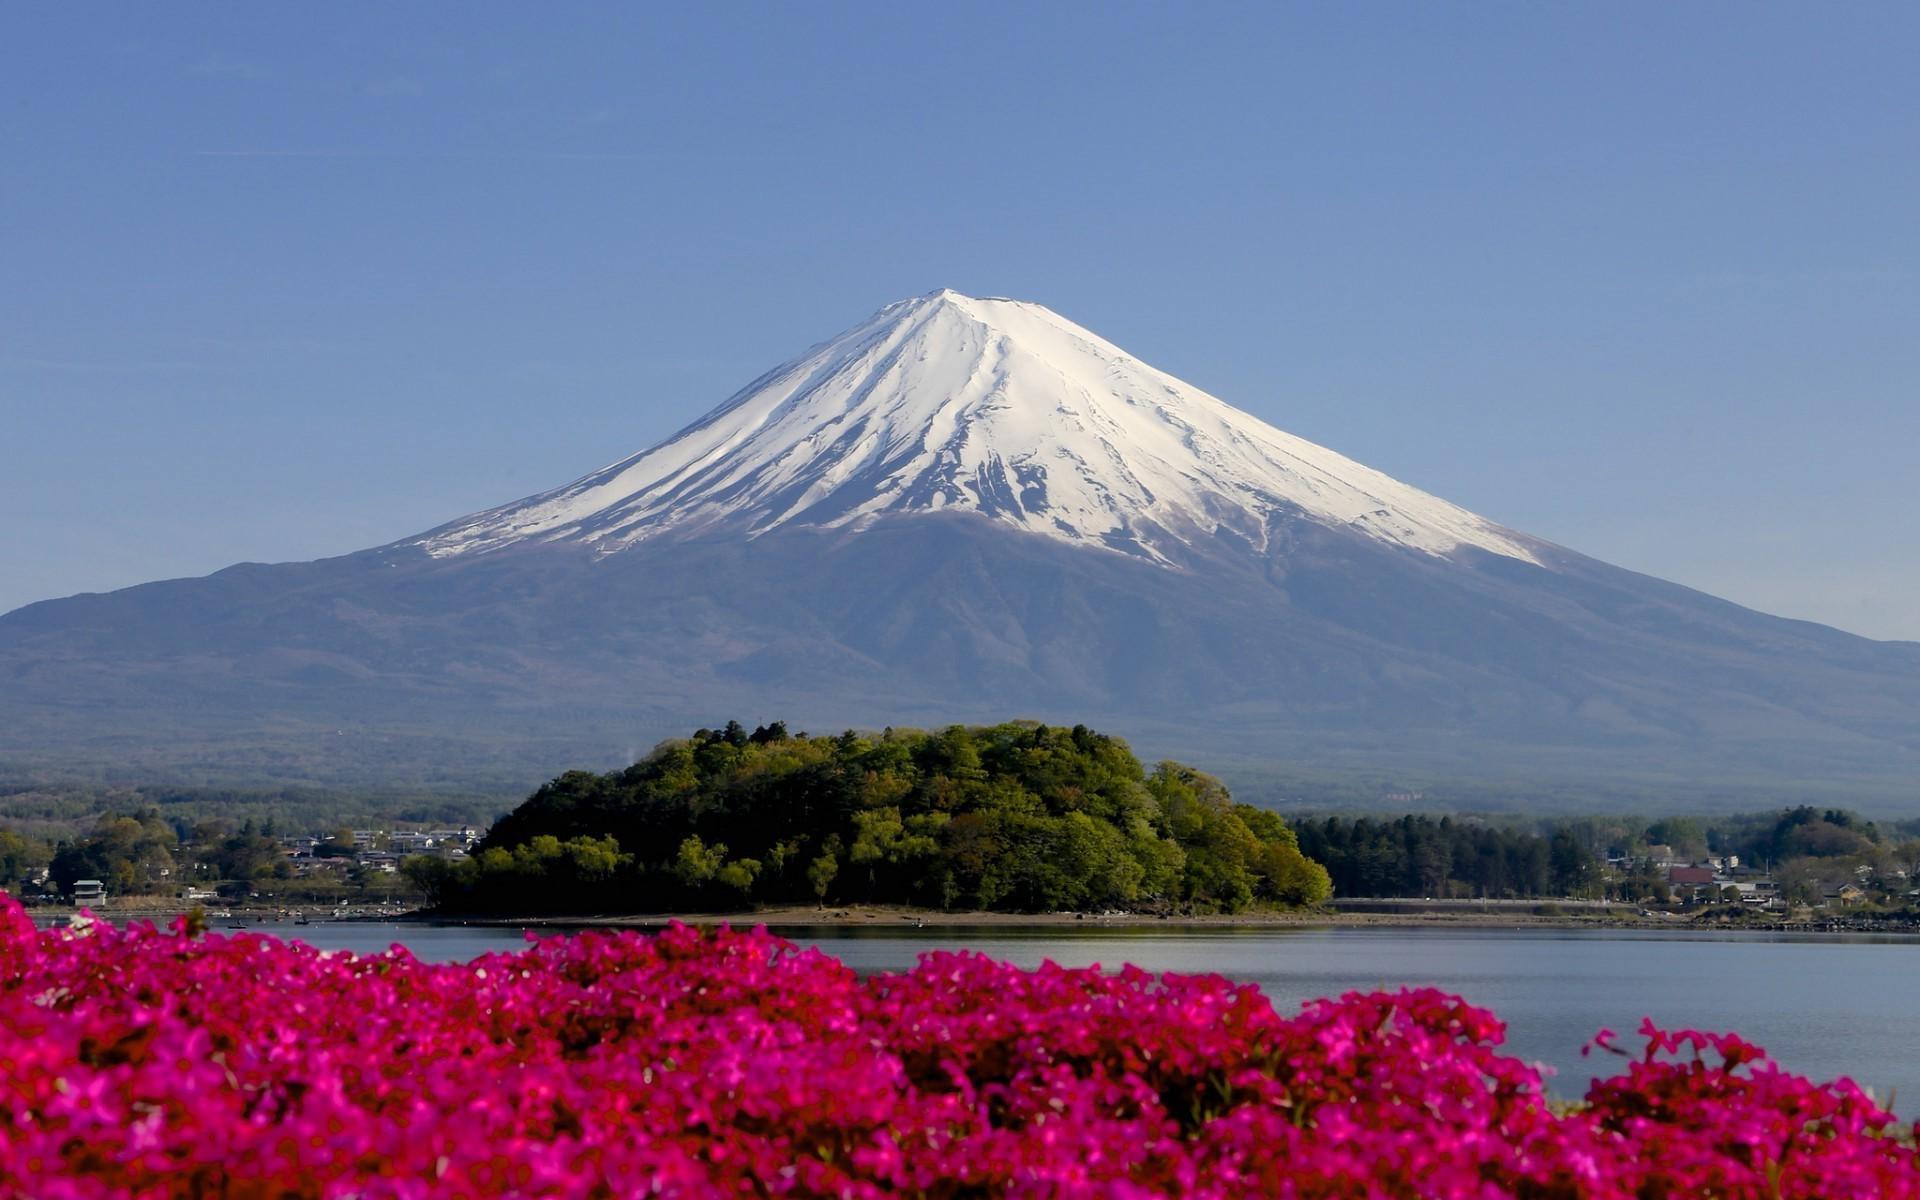 Japan Landscape Mount Fuji Wallpaper And Background - Japan Landscape Mount Fuji , HD Wallpaper & Backgrounds